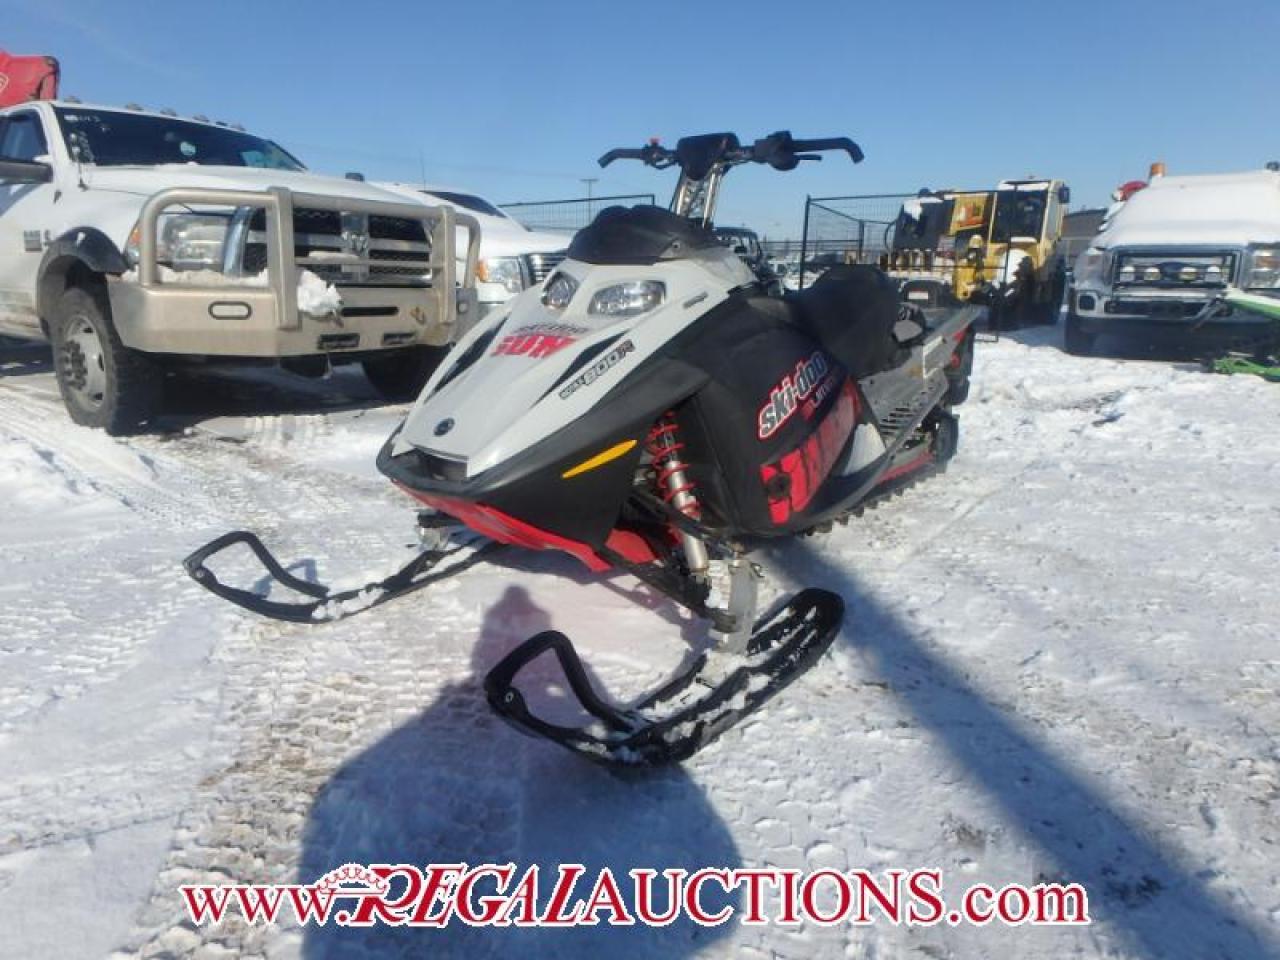 Photo of  2007 SKI DOO SUMMIT 800 R  SNOWMOBILE